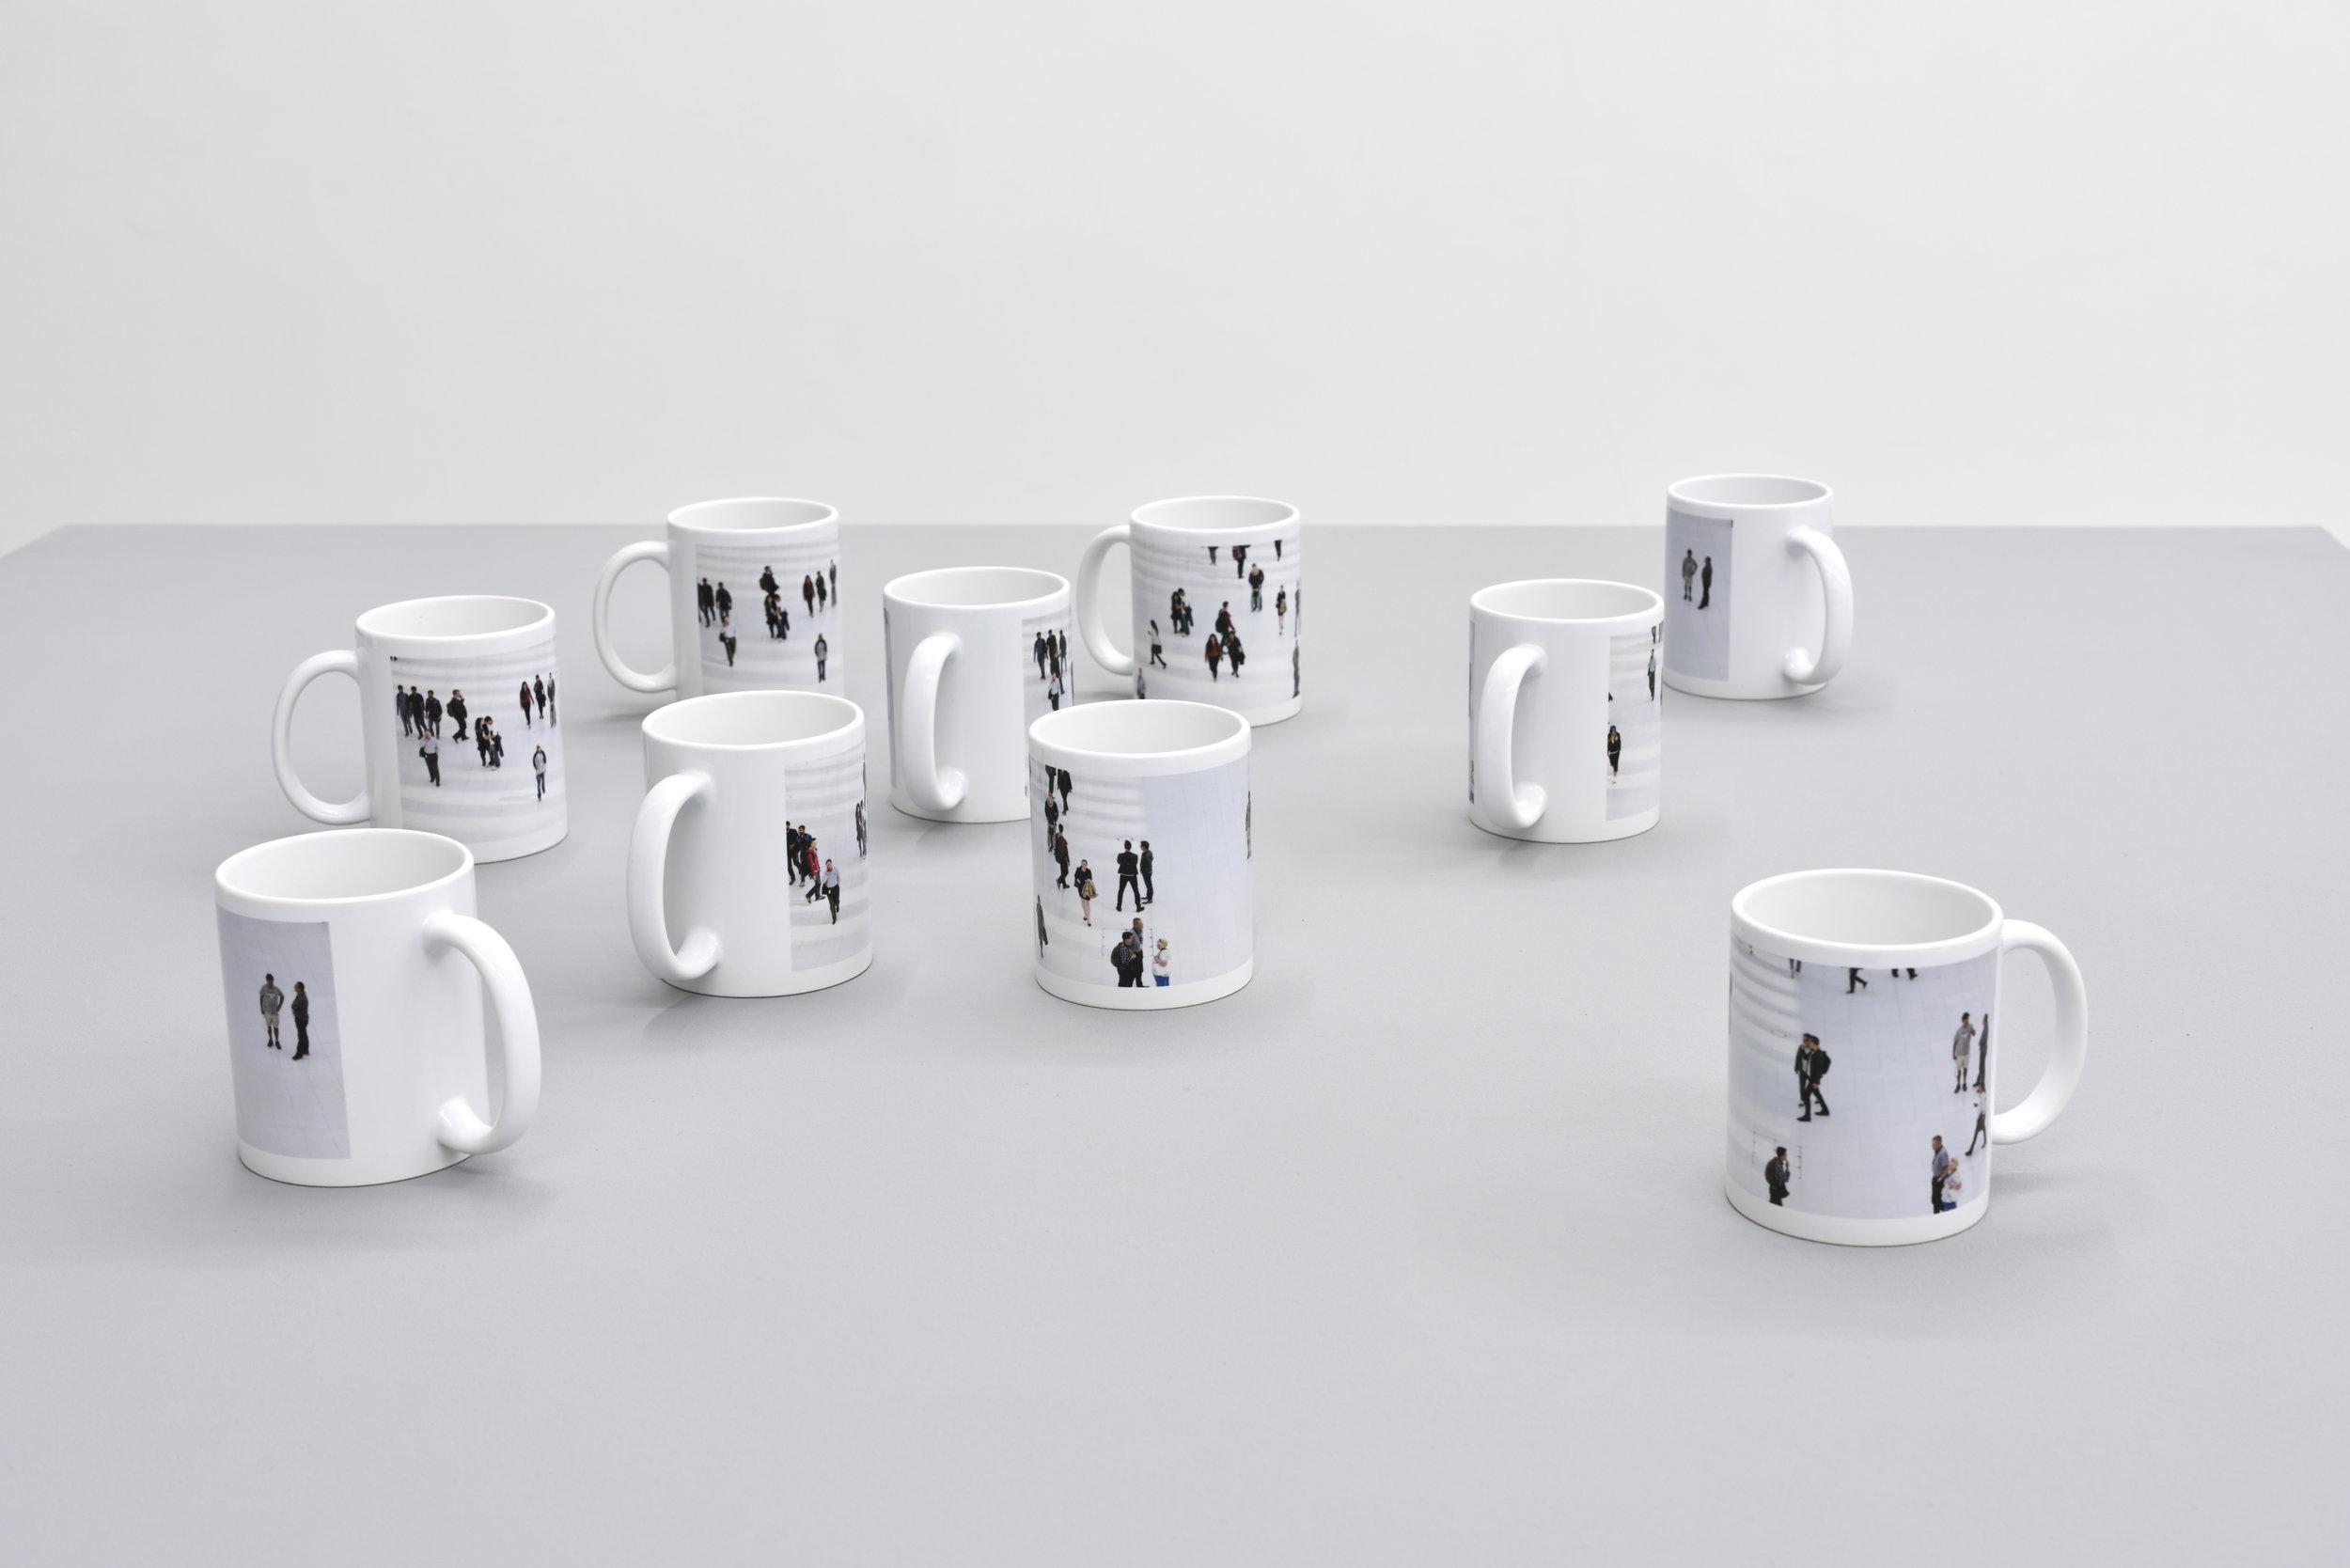 Untitled (mugs), 2017 digital prints on ceramics variable dimensions